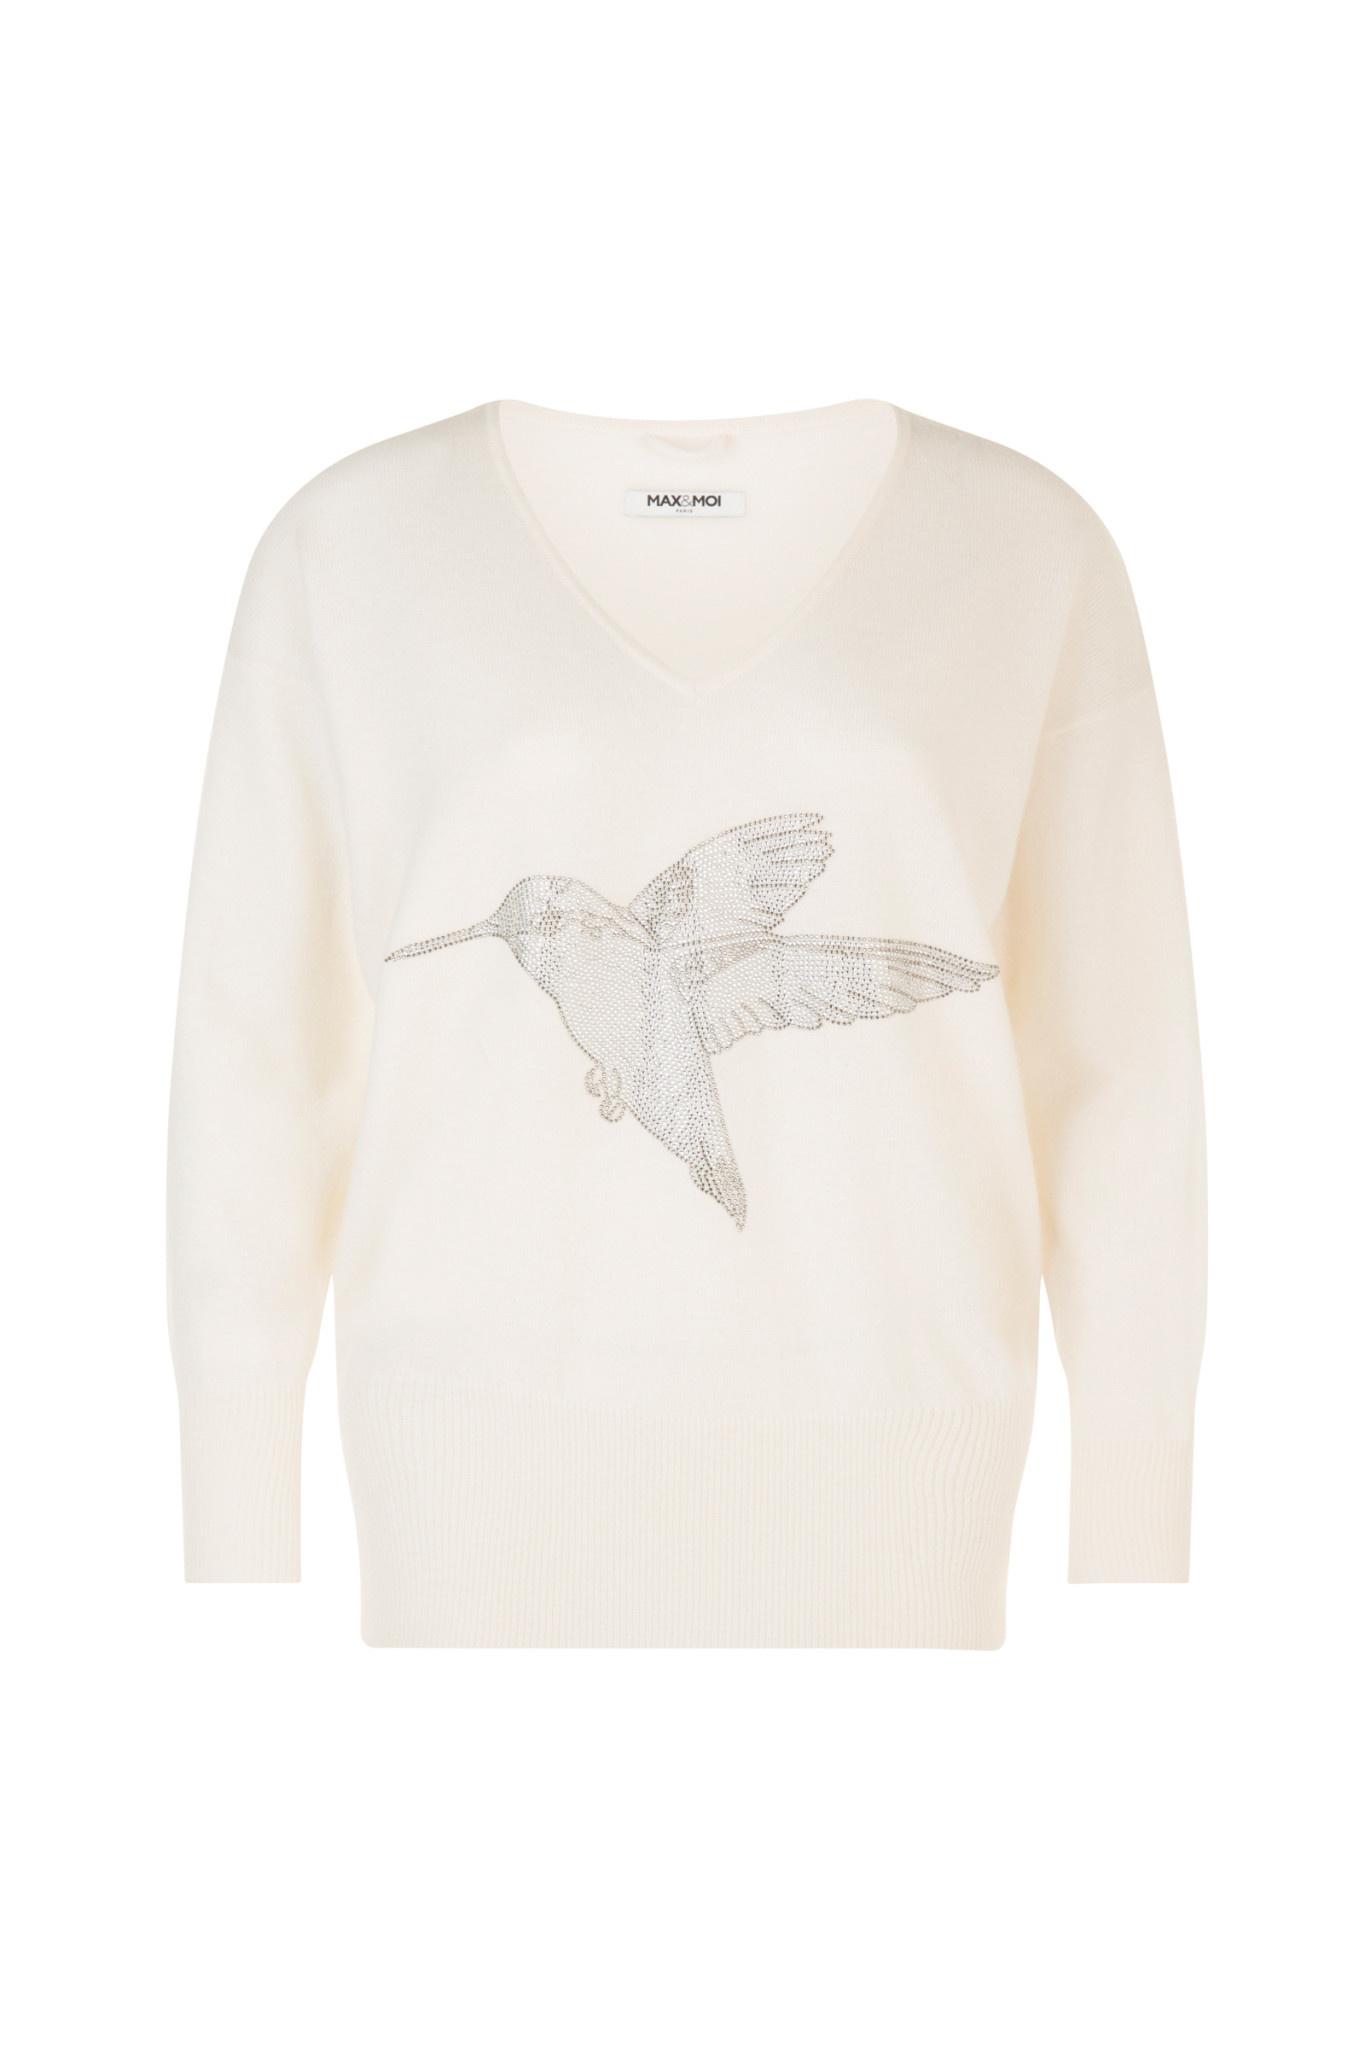 Babylon sweater max & moi-1